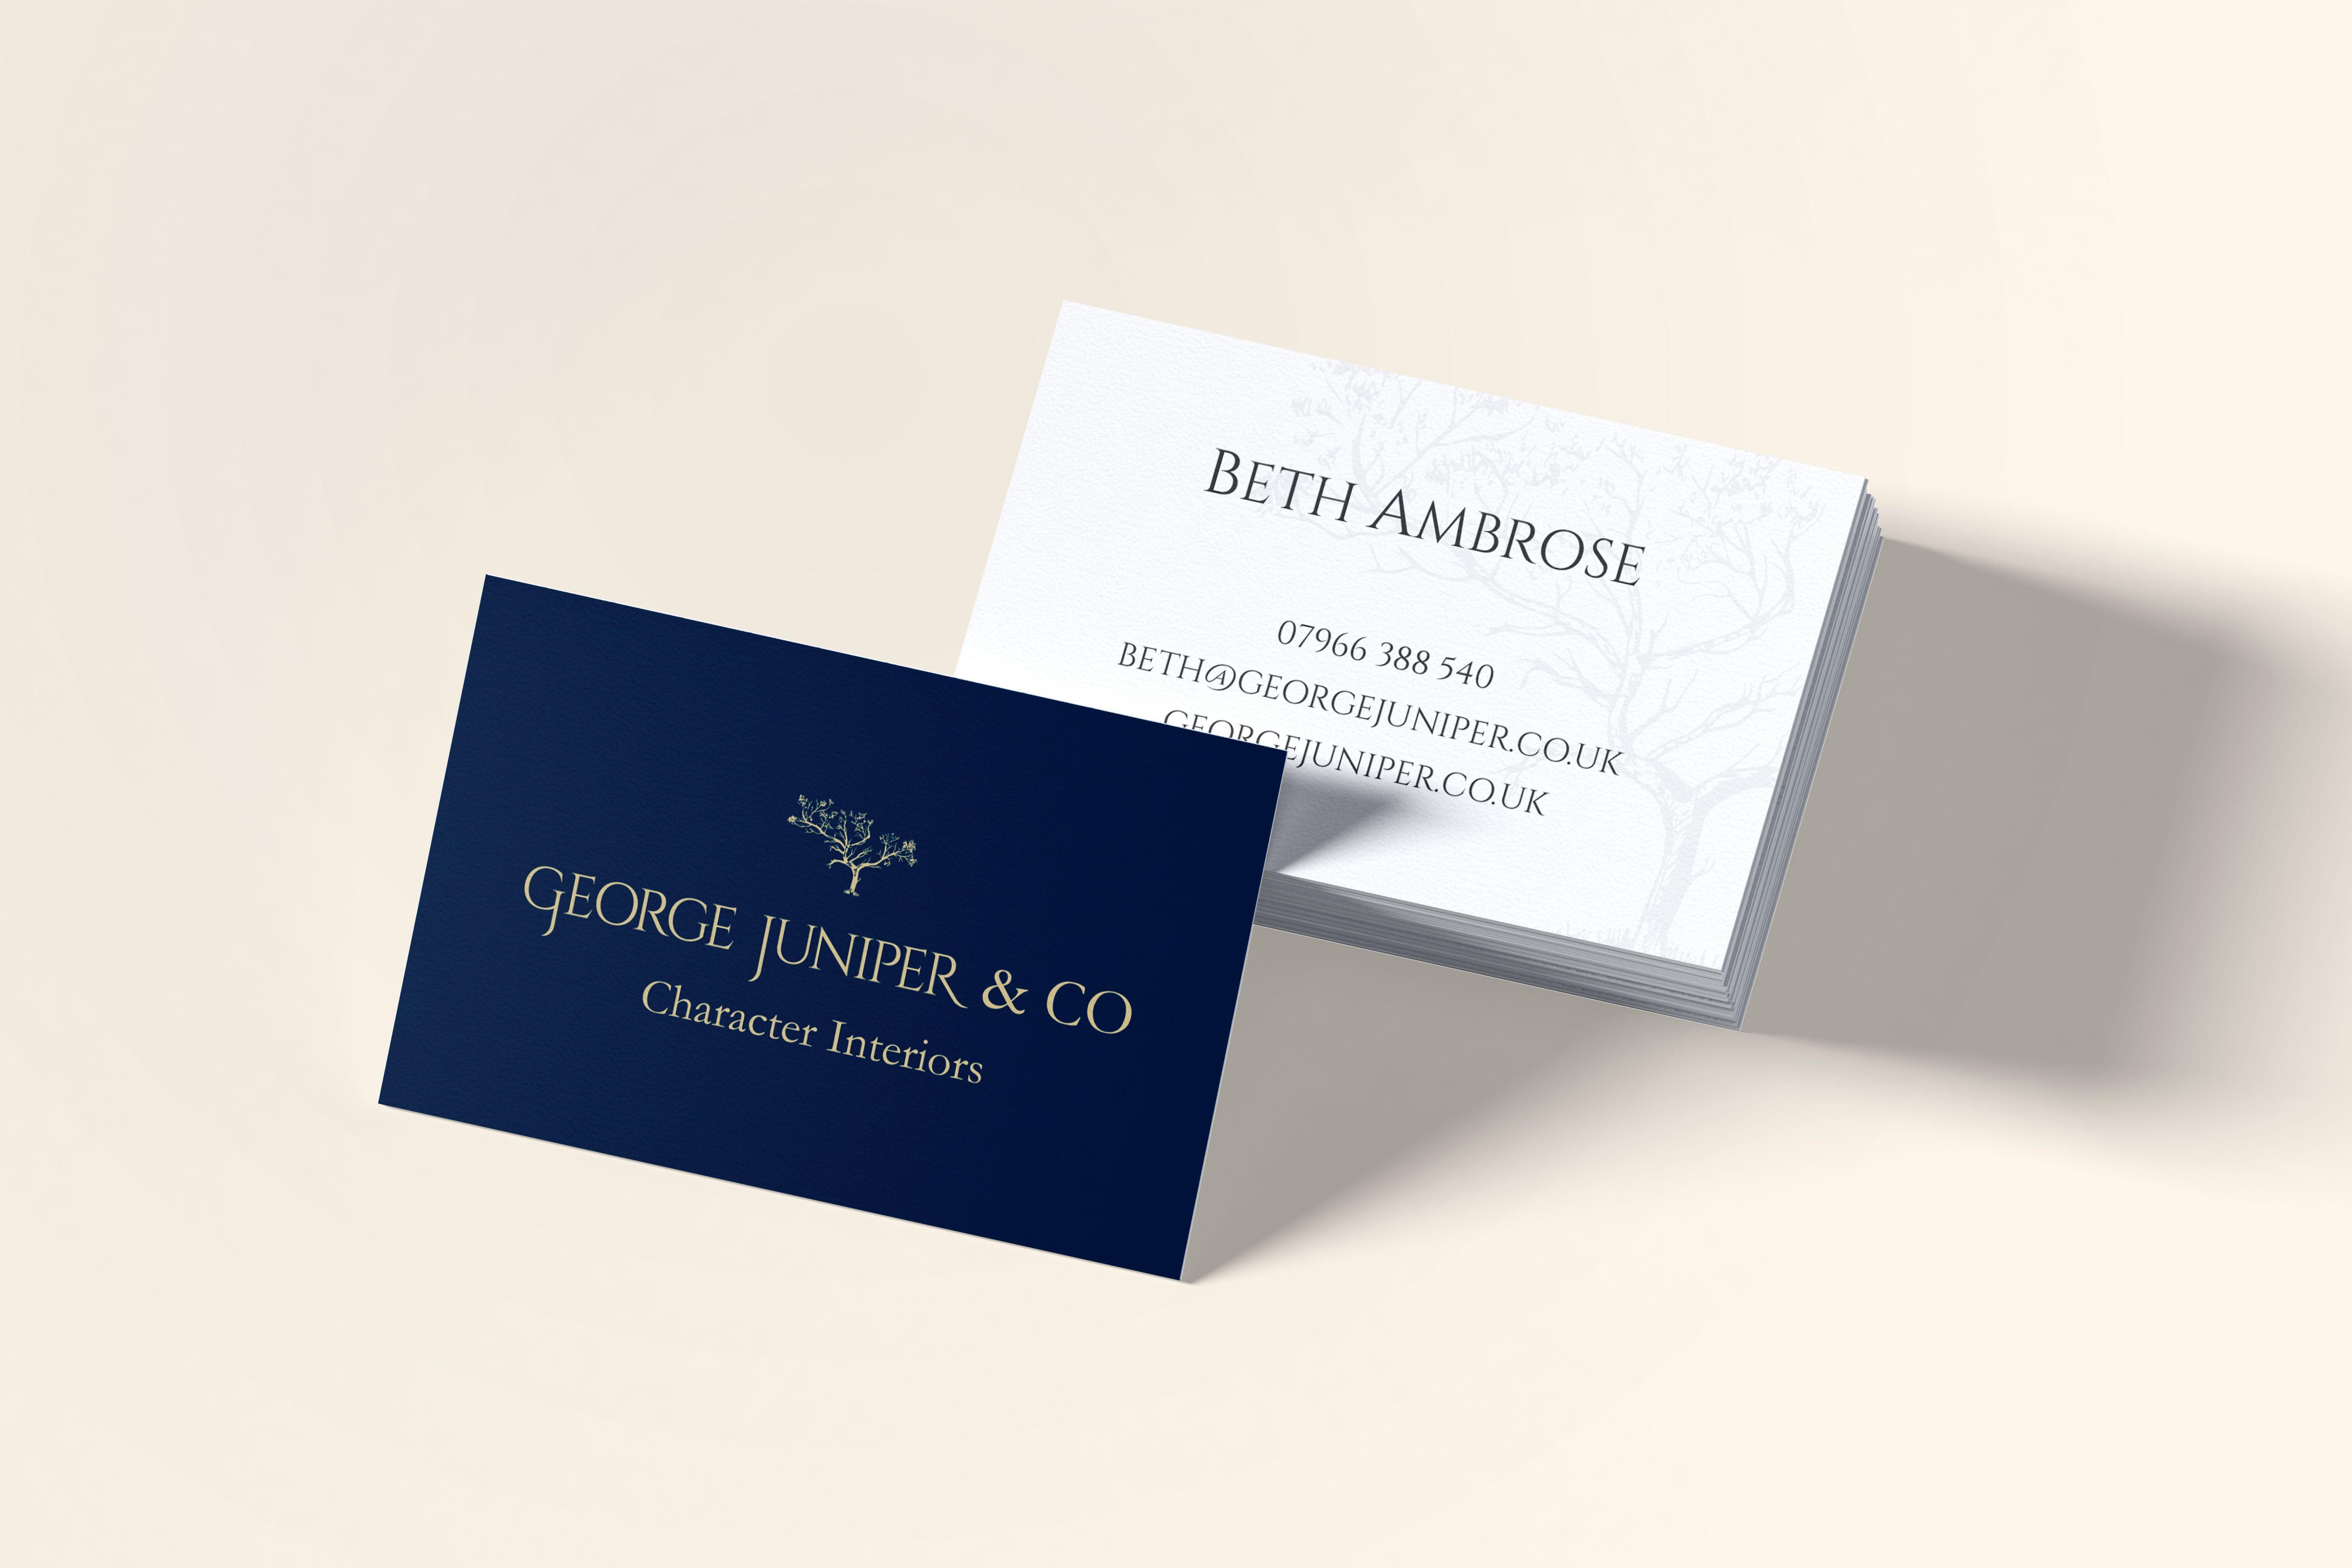 George Juniper Co Business Cards Business Card Design Web Design Services Graphic Design Services